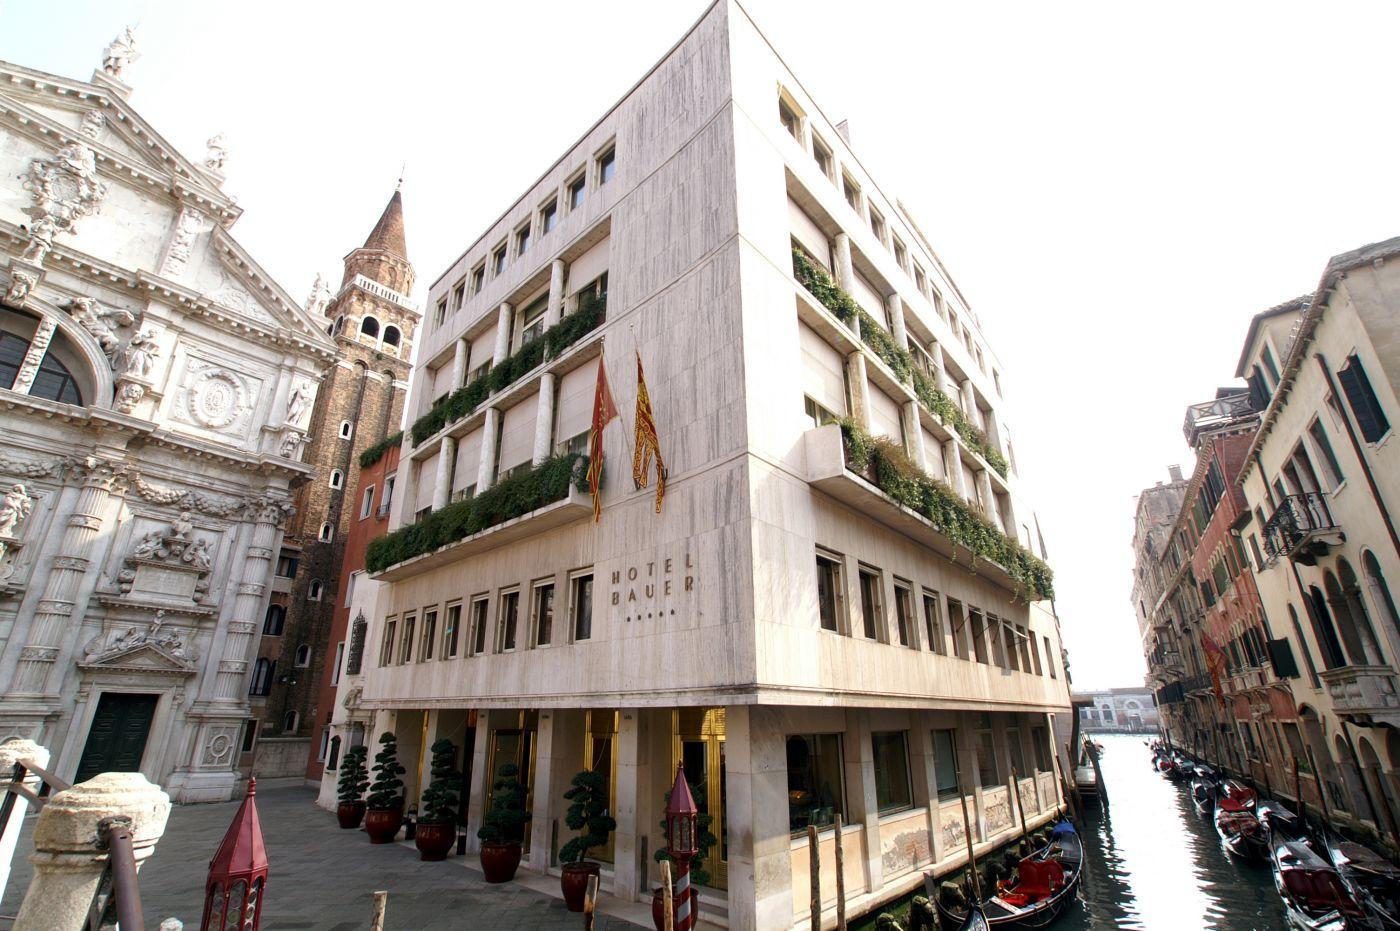 Bauer Hotel Il Palazzo Venice Exterior next to Gondolas